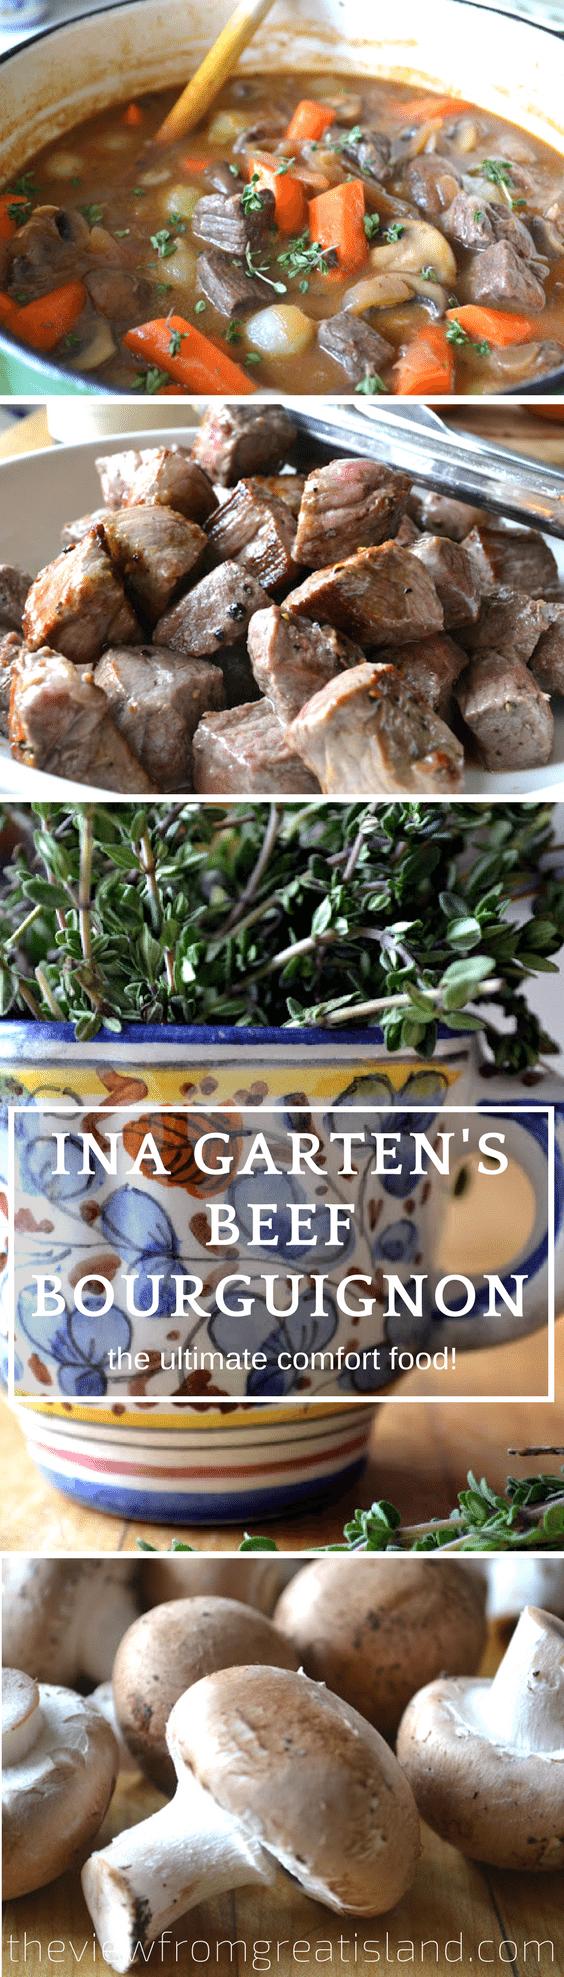 Ina Garten's Beef Bourguignon ~ the ultimate homey dish from the Queen of comfort food herself! This easy beef stew will quickly become a family favorite. #stew #inagarten #dinner #easybeefbourguignon #beef #certifiedangusbeef #comfortfood #frenchrecipe #bestbeefbourguignon